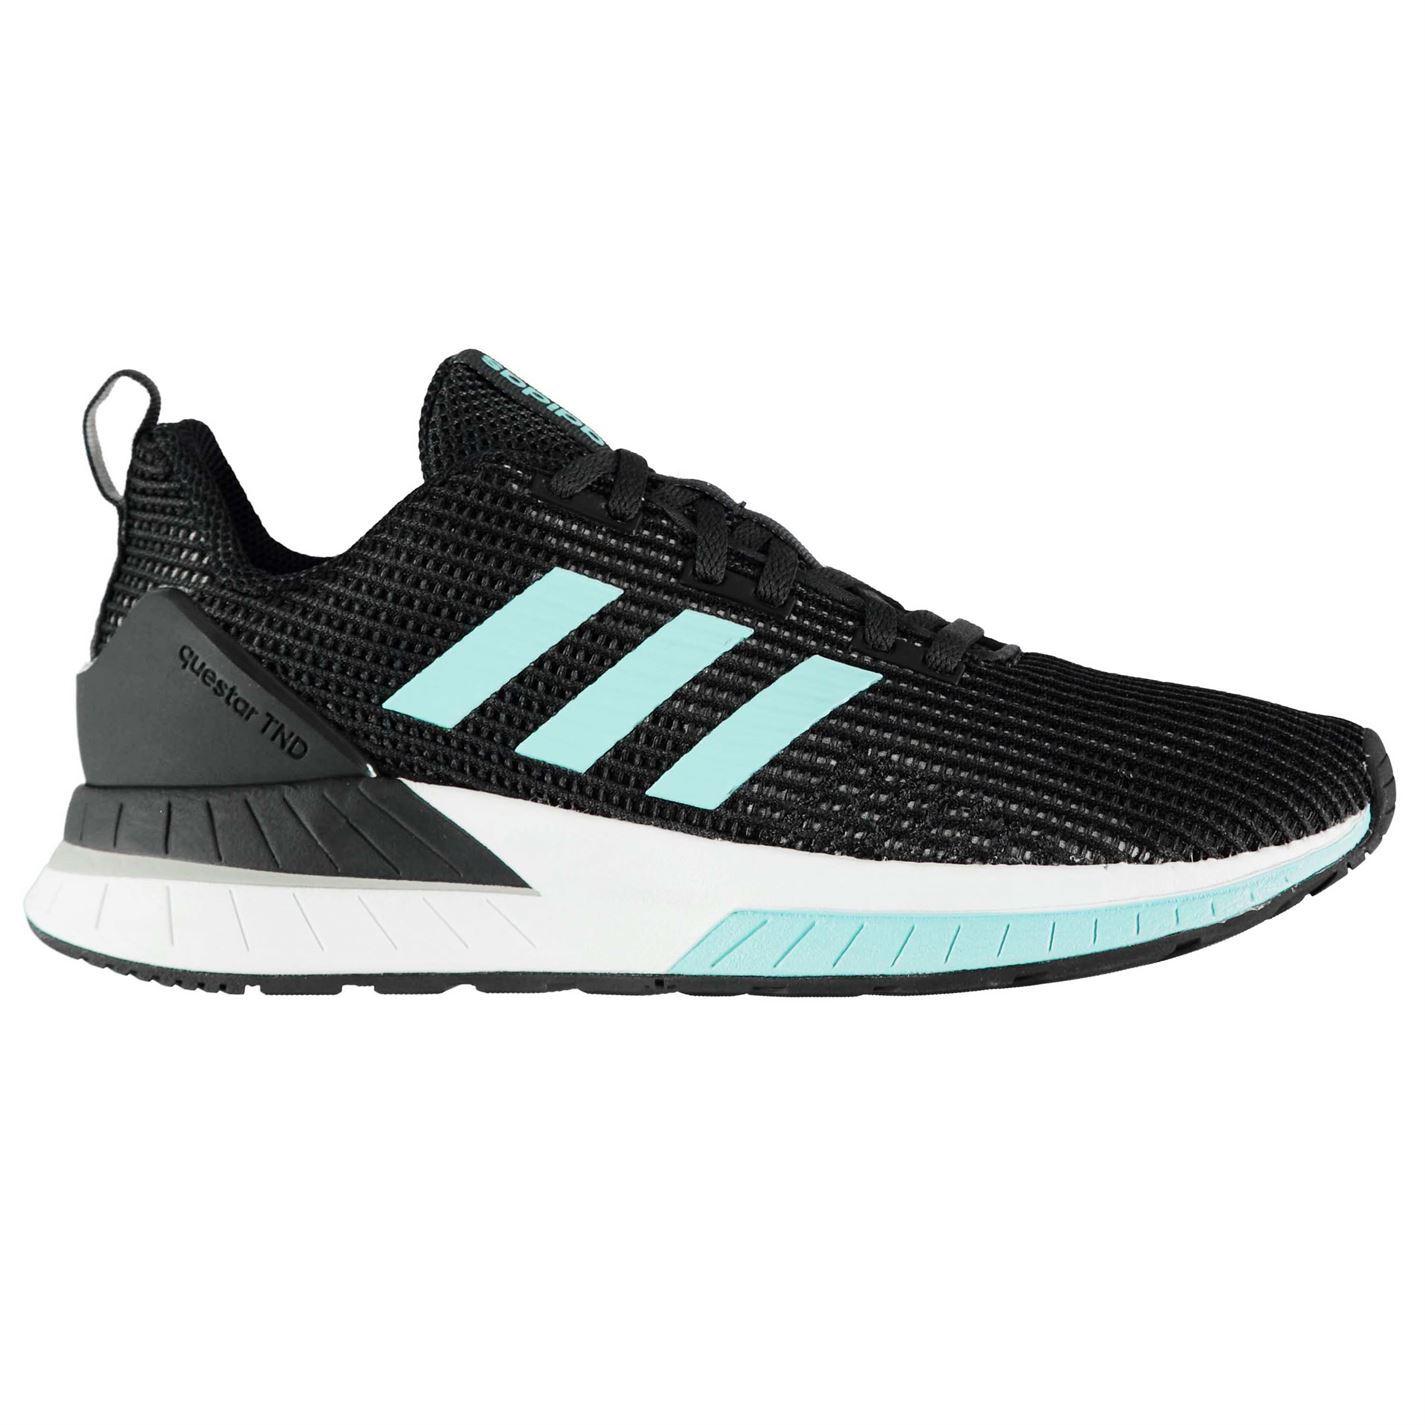 adidas Questar TND Running Shoes Ladies Road Ortholite | eBay